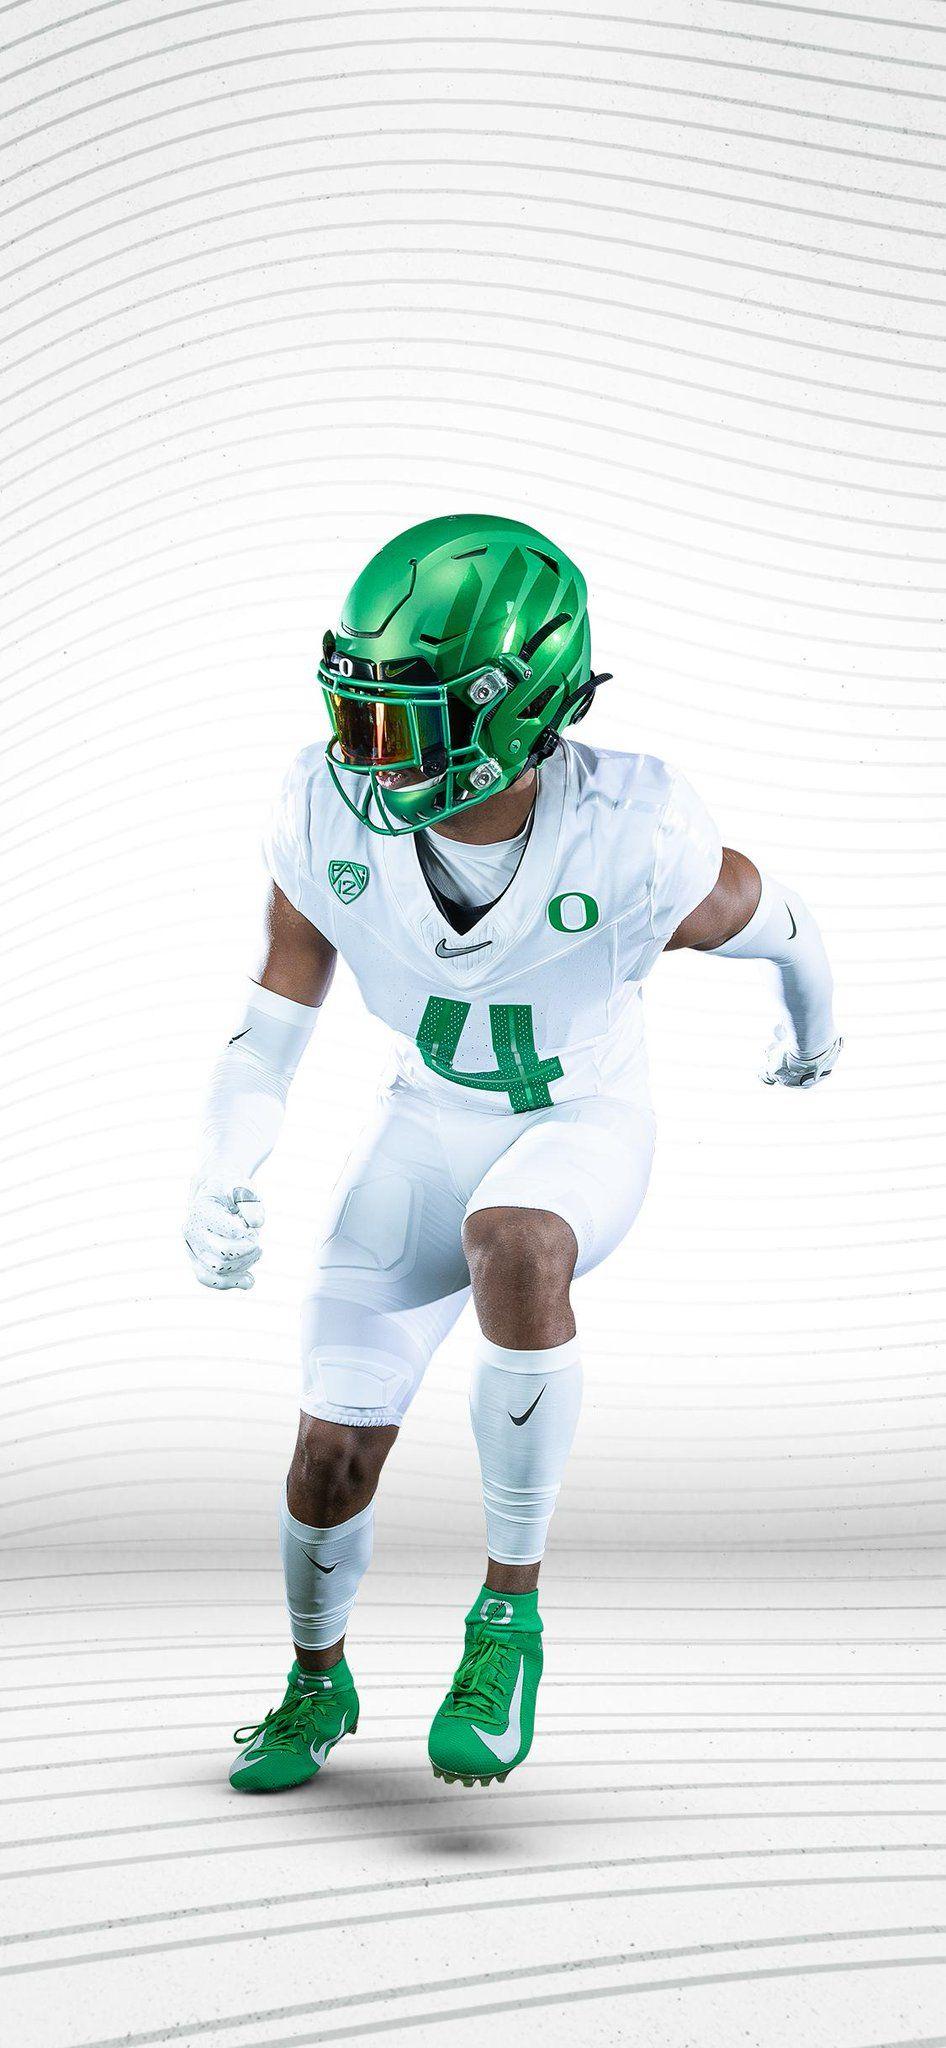 2019 University Of Oregon Ducks Football Uniforms Green Helmet White Jersey White Pants Oregon Ducks Football Ducks Football Football Uniforms